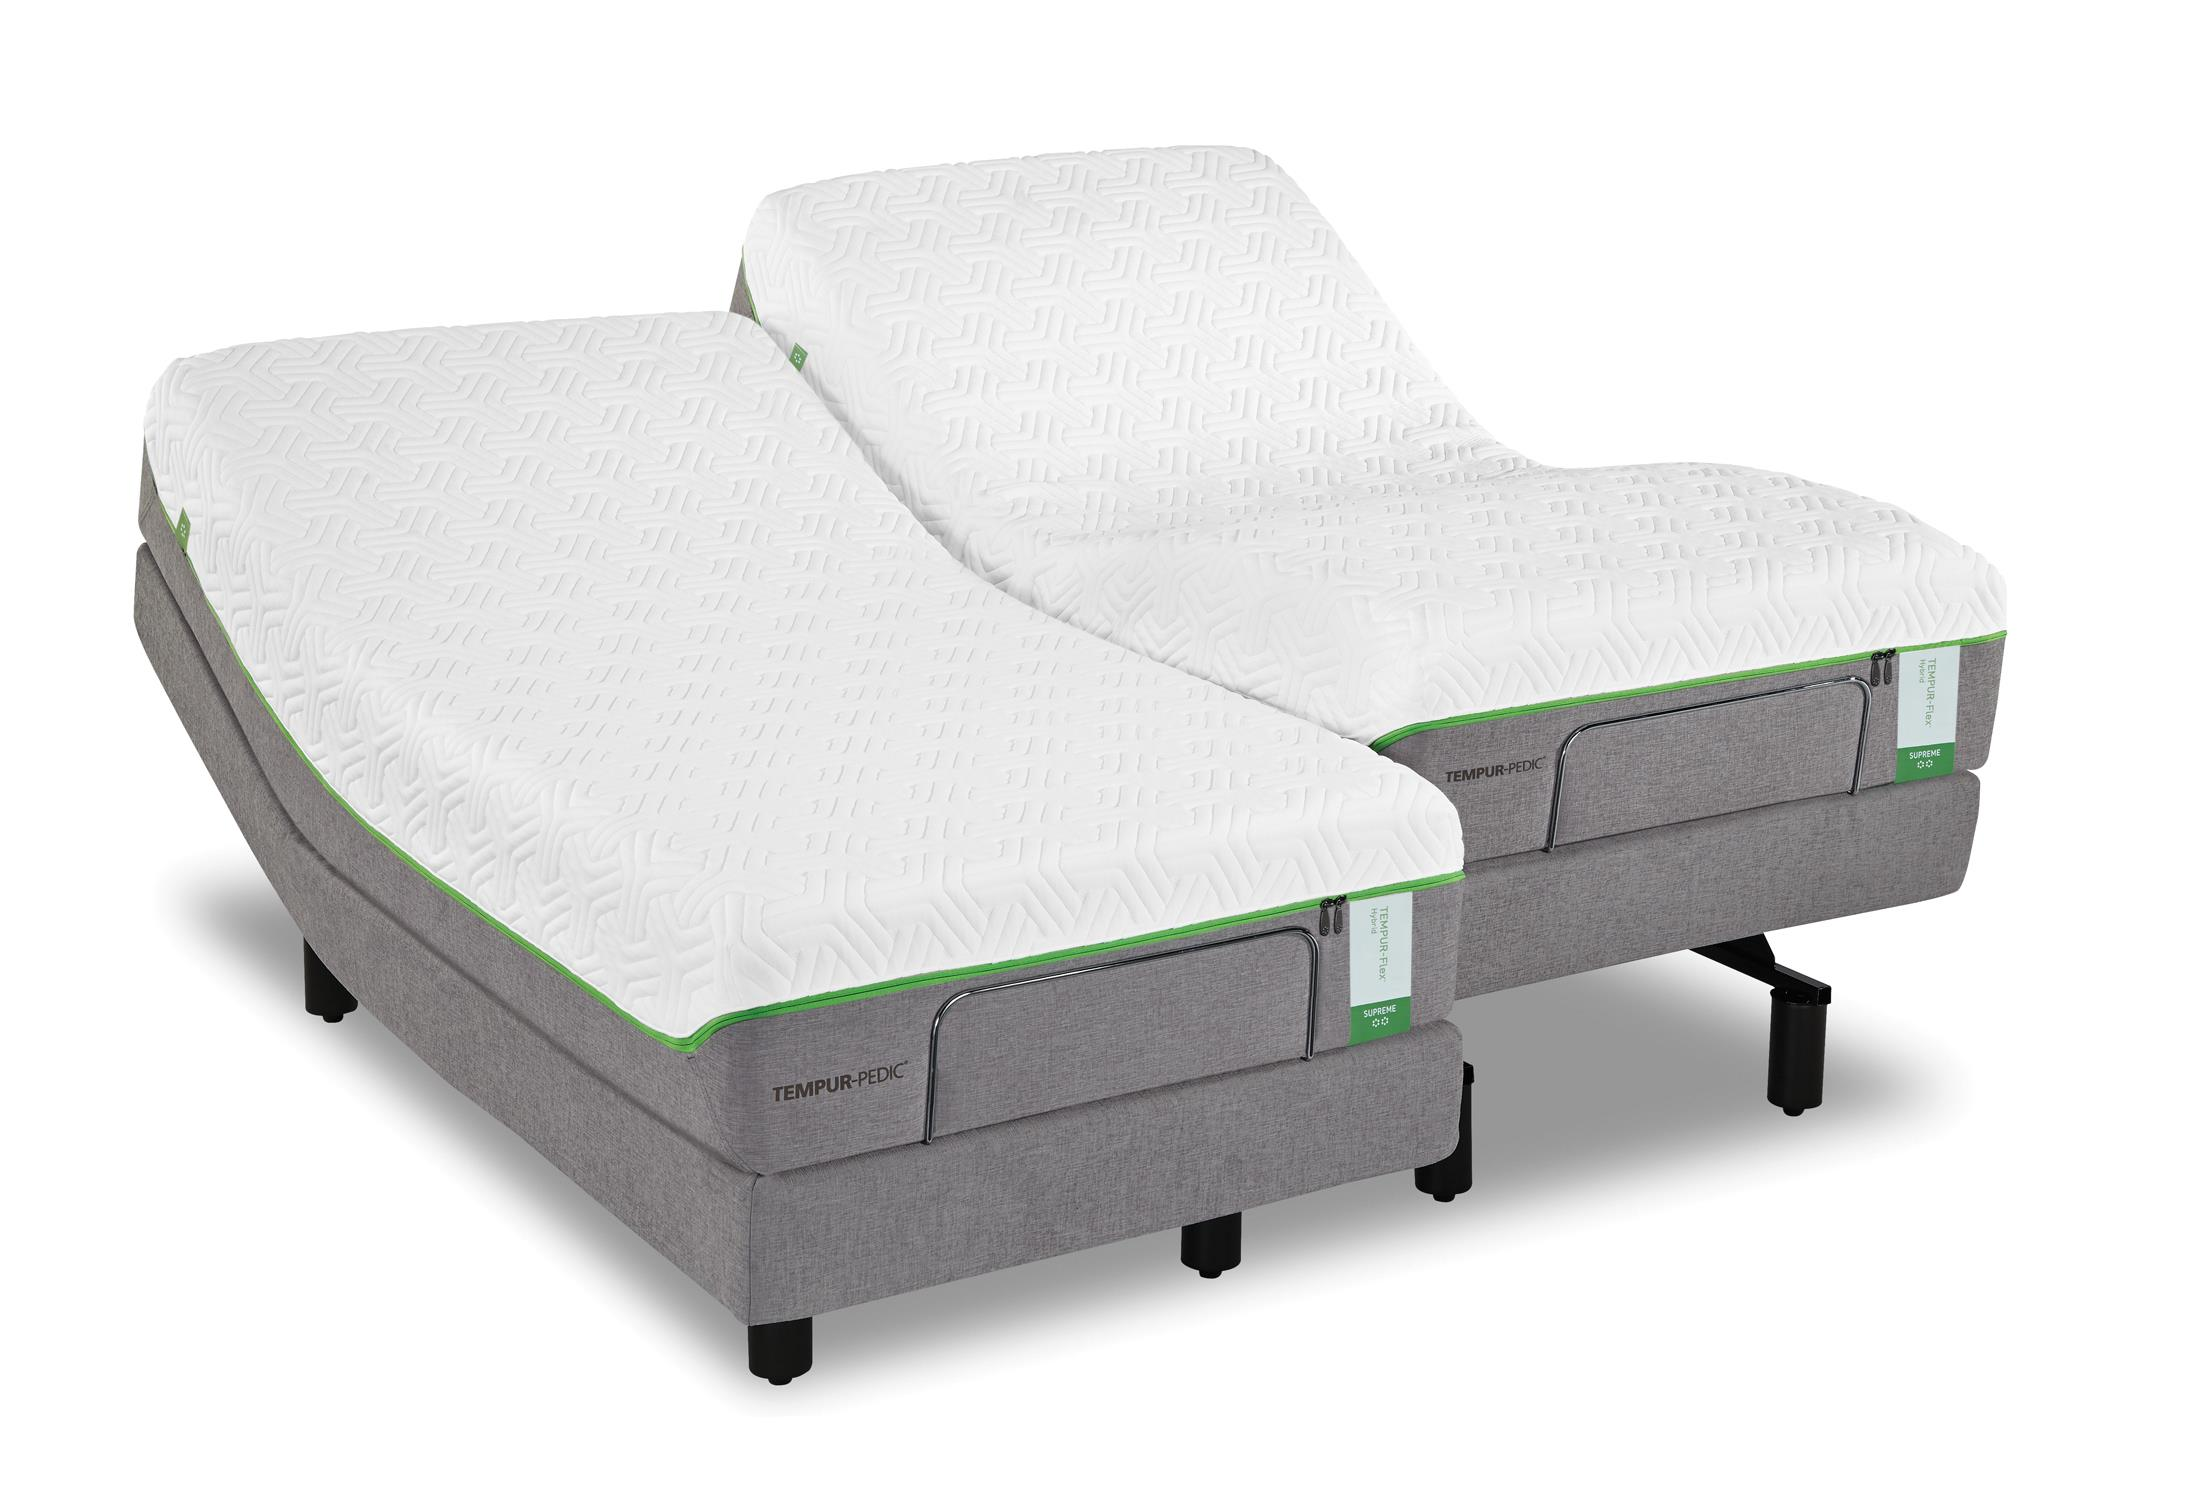 Tempur-Pedic® TEMPUR-Flex Prima King Medium Firm Mattress Set - Item Number: 10115270+2x25289220